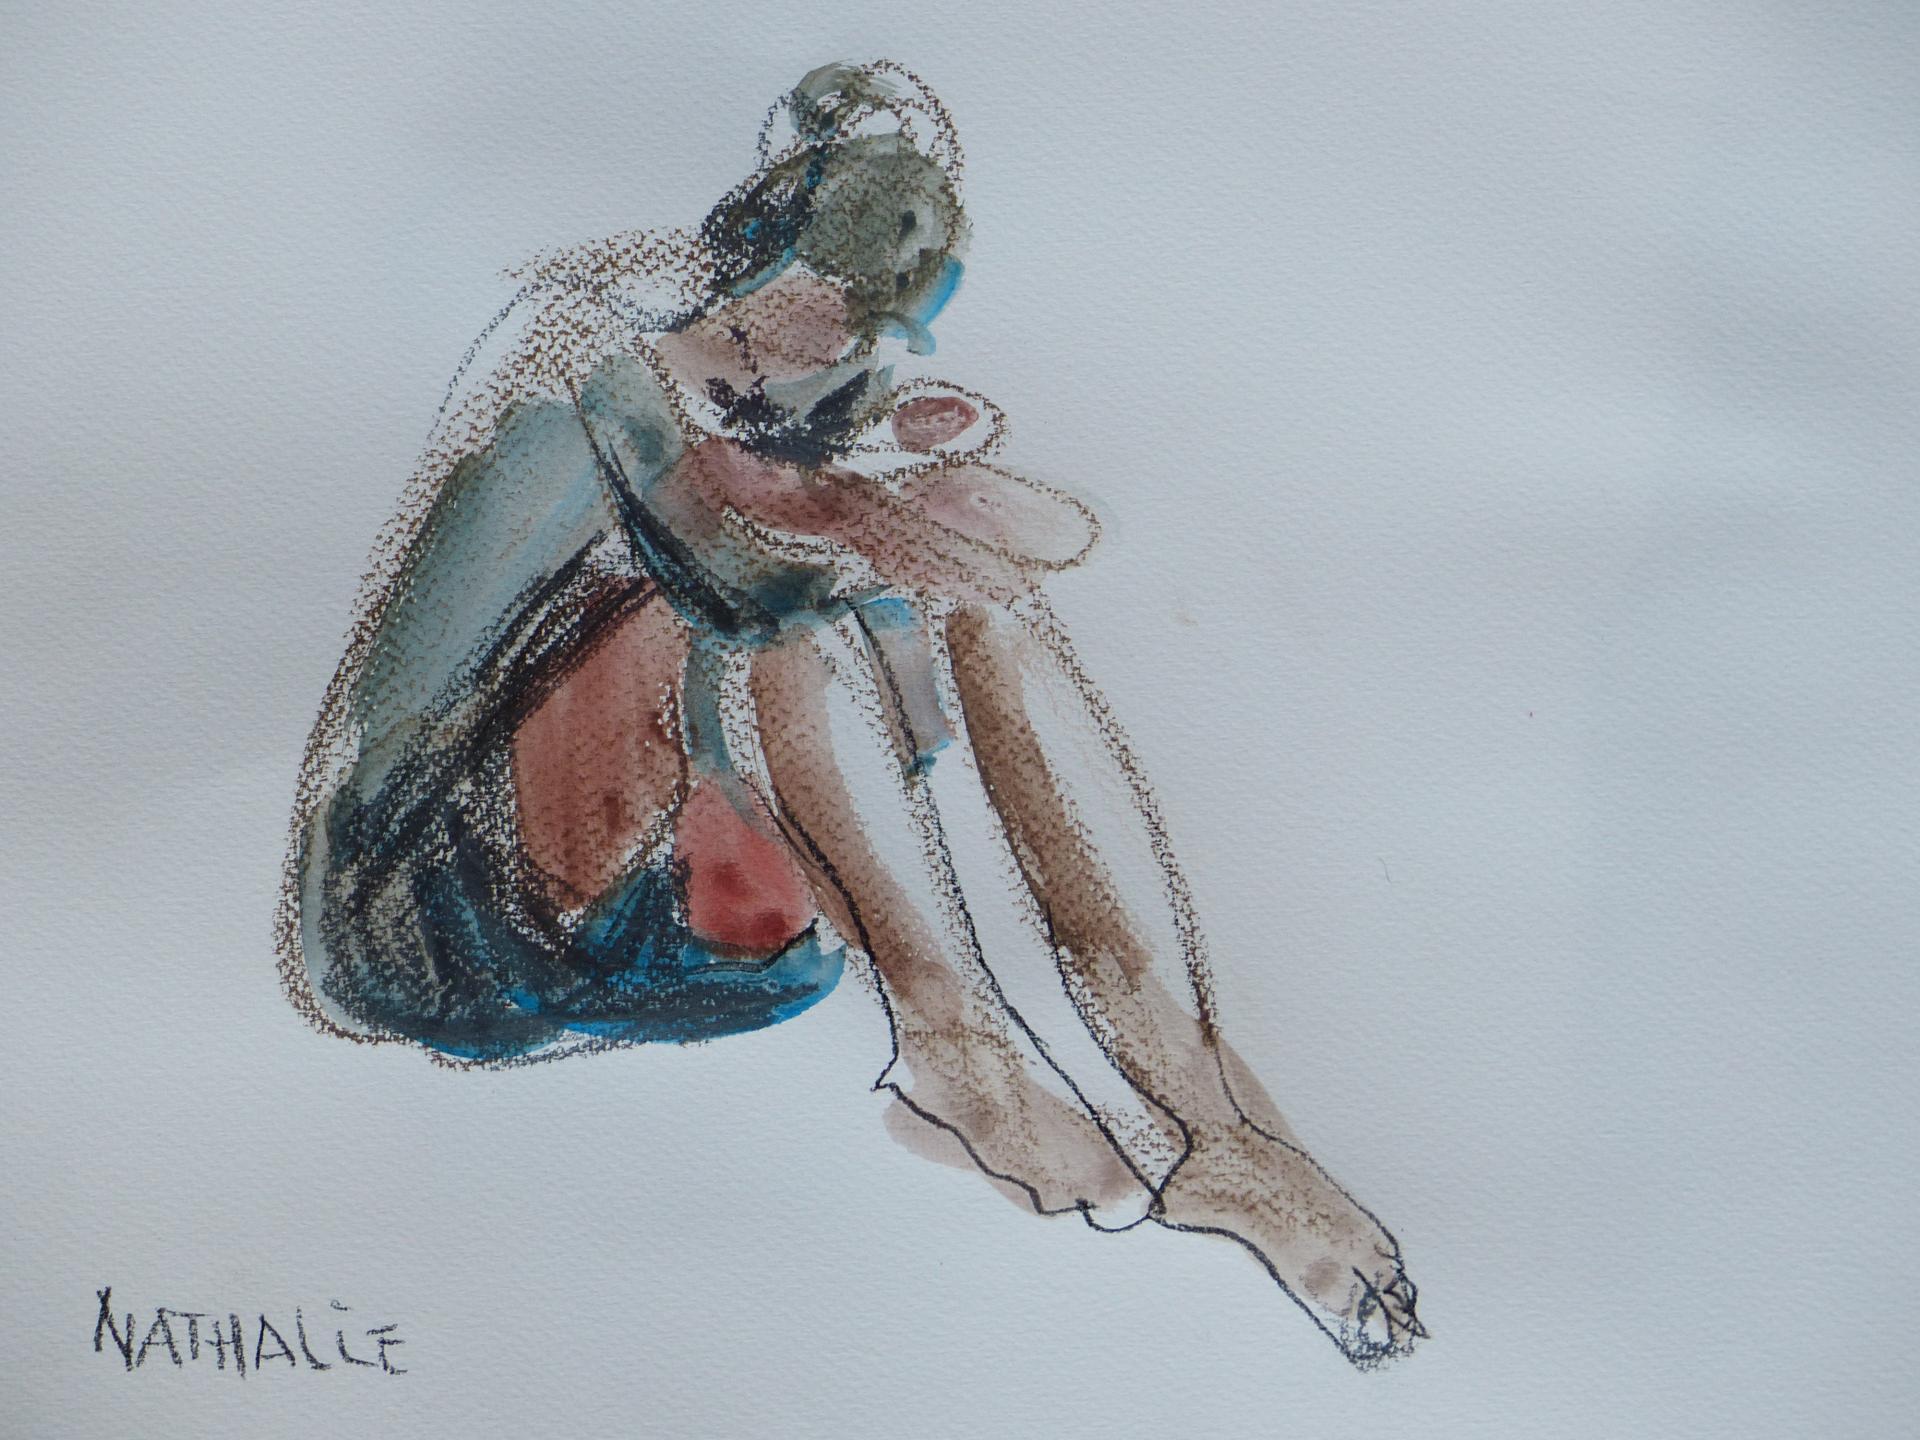 Nathalie (5)